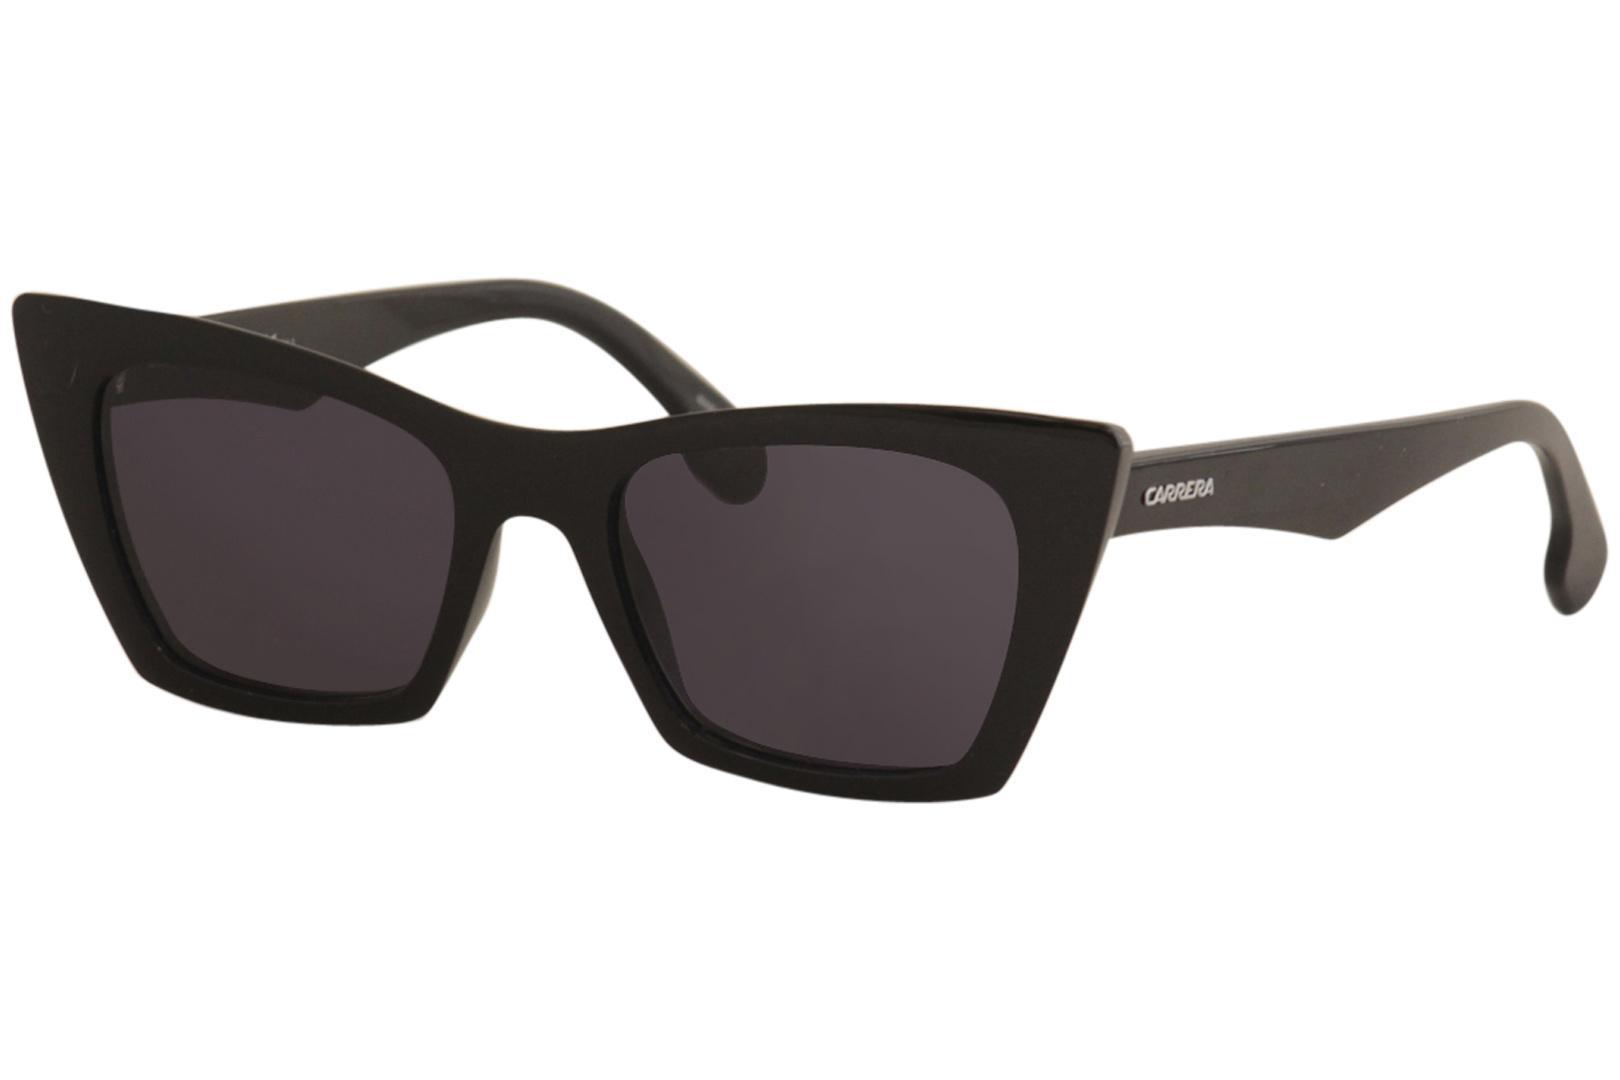 d36a742c23f0 Carrera Women's 5044S 5044/S Fashion Rectangle Sunglasses